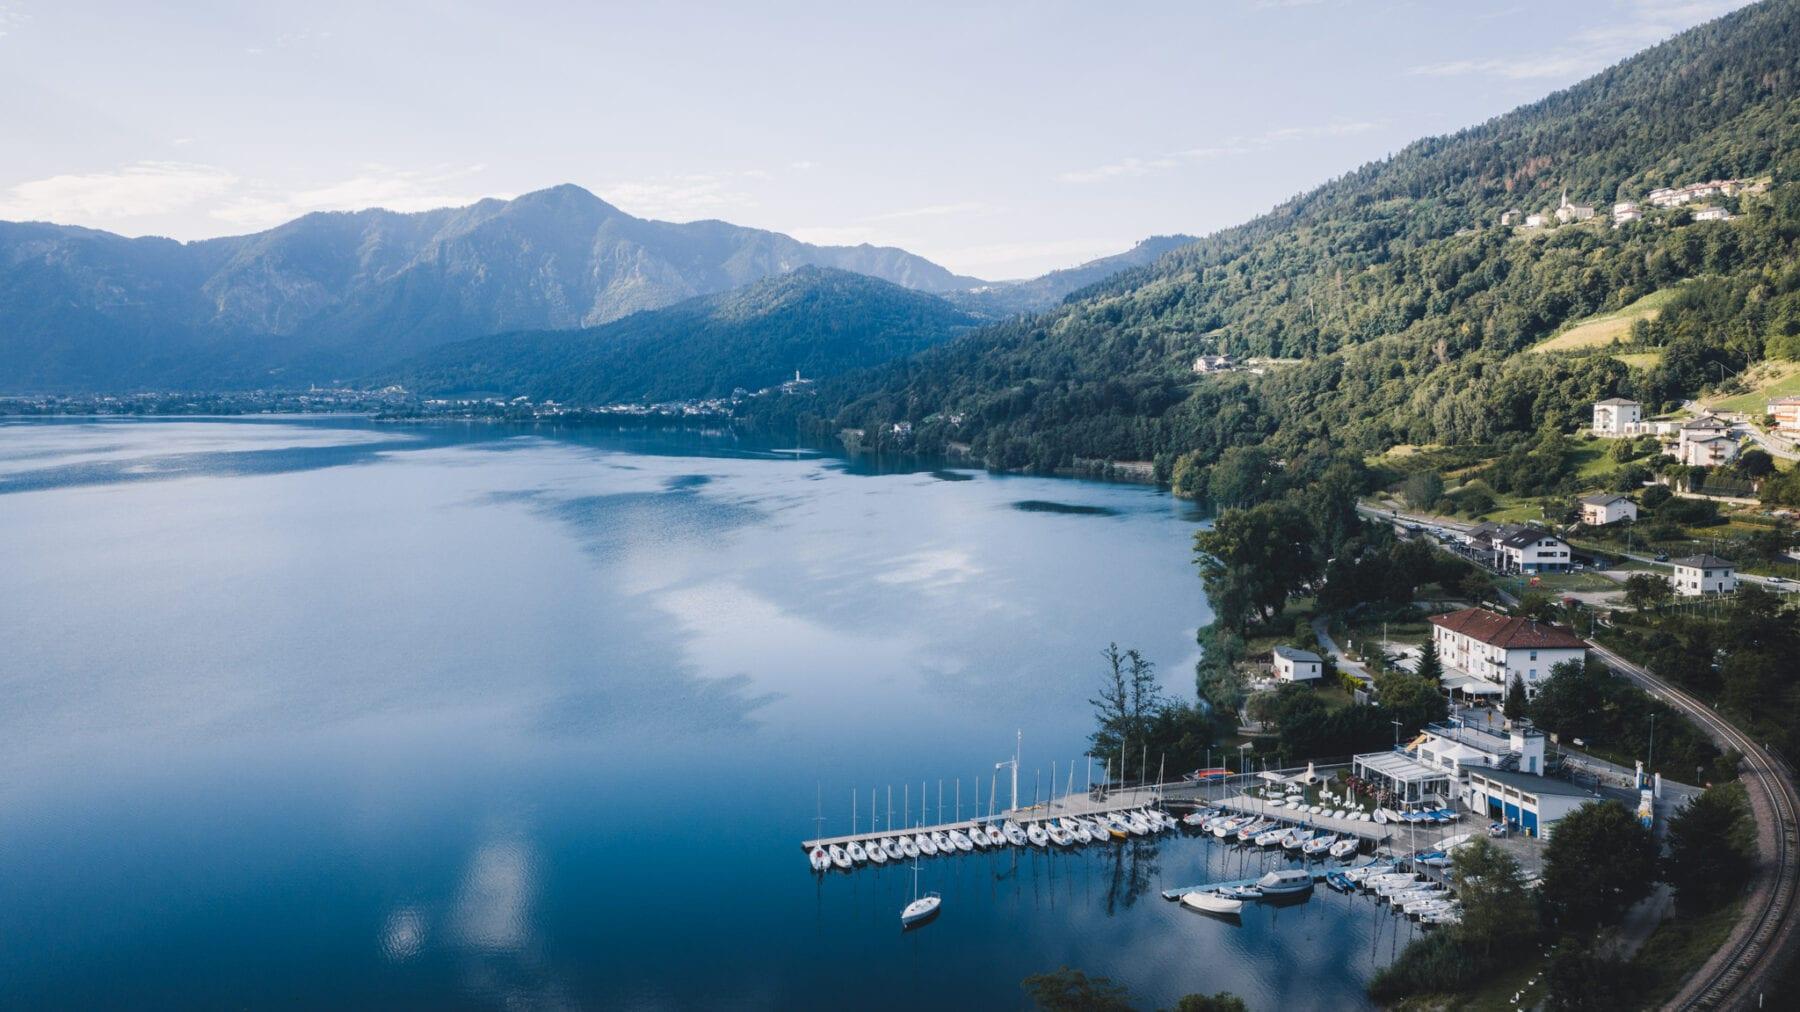 Lago di Caldonazzo zeilboot